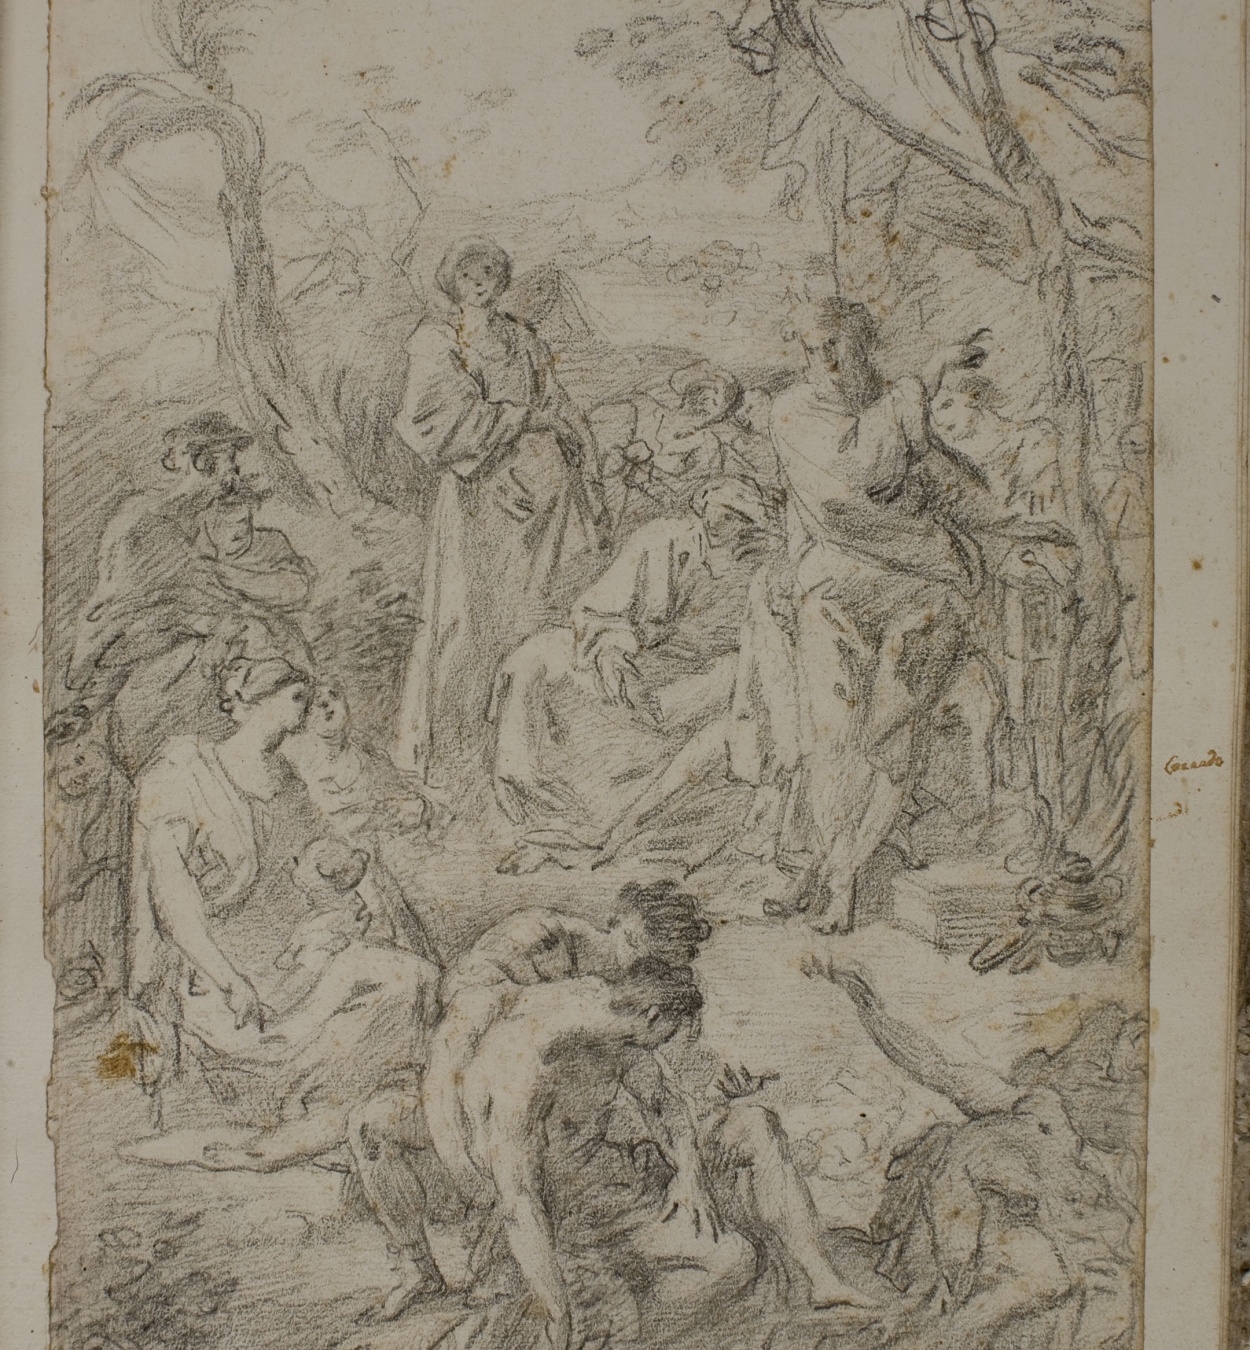 Domingo Álvarez Enciso - Roman album - Circa 1758-1762 or 1773-1789 [5]